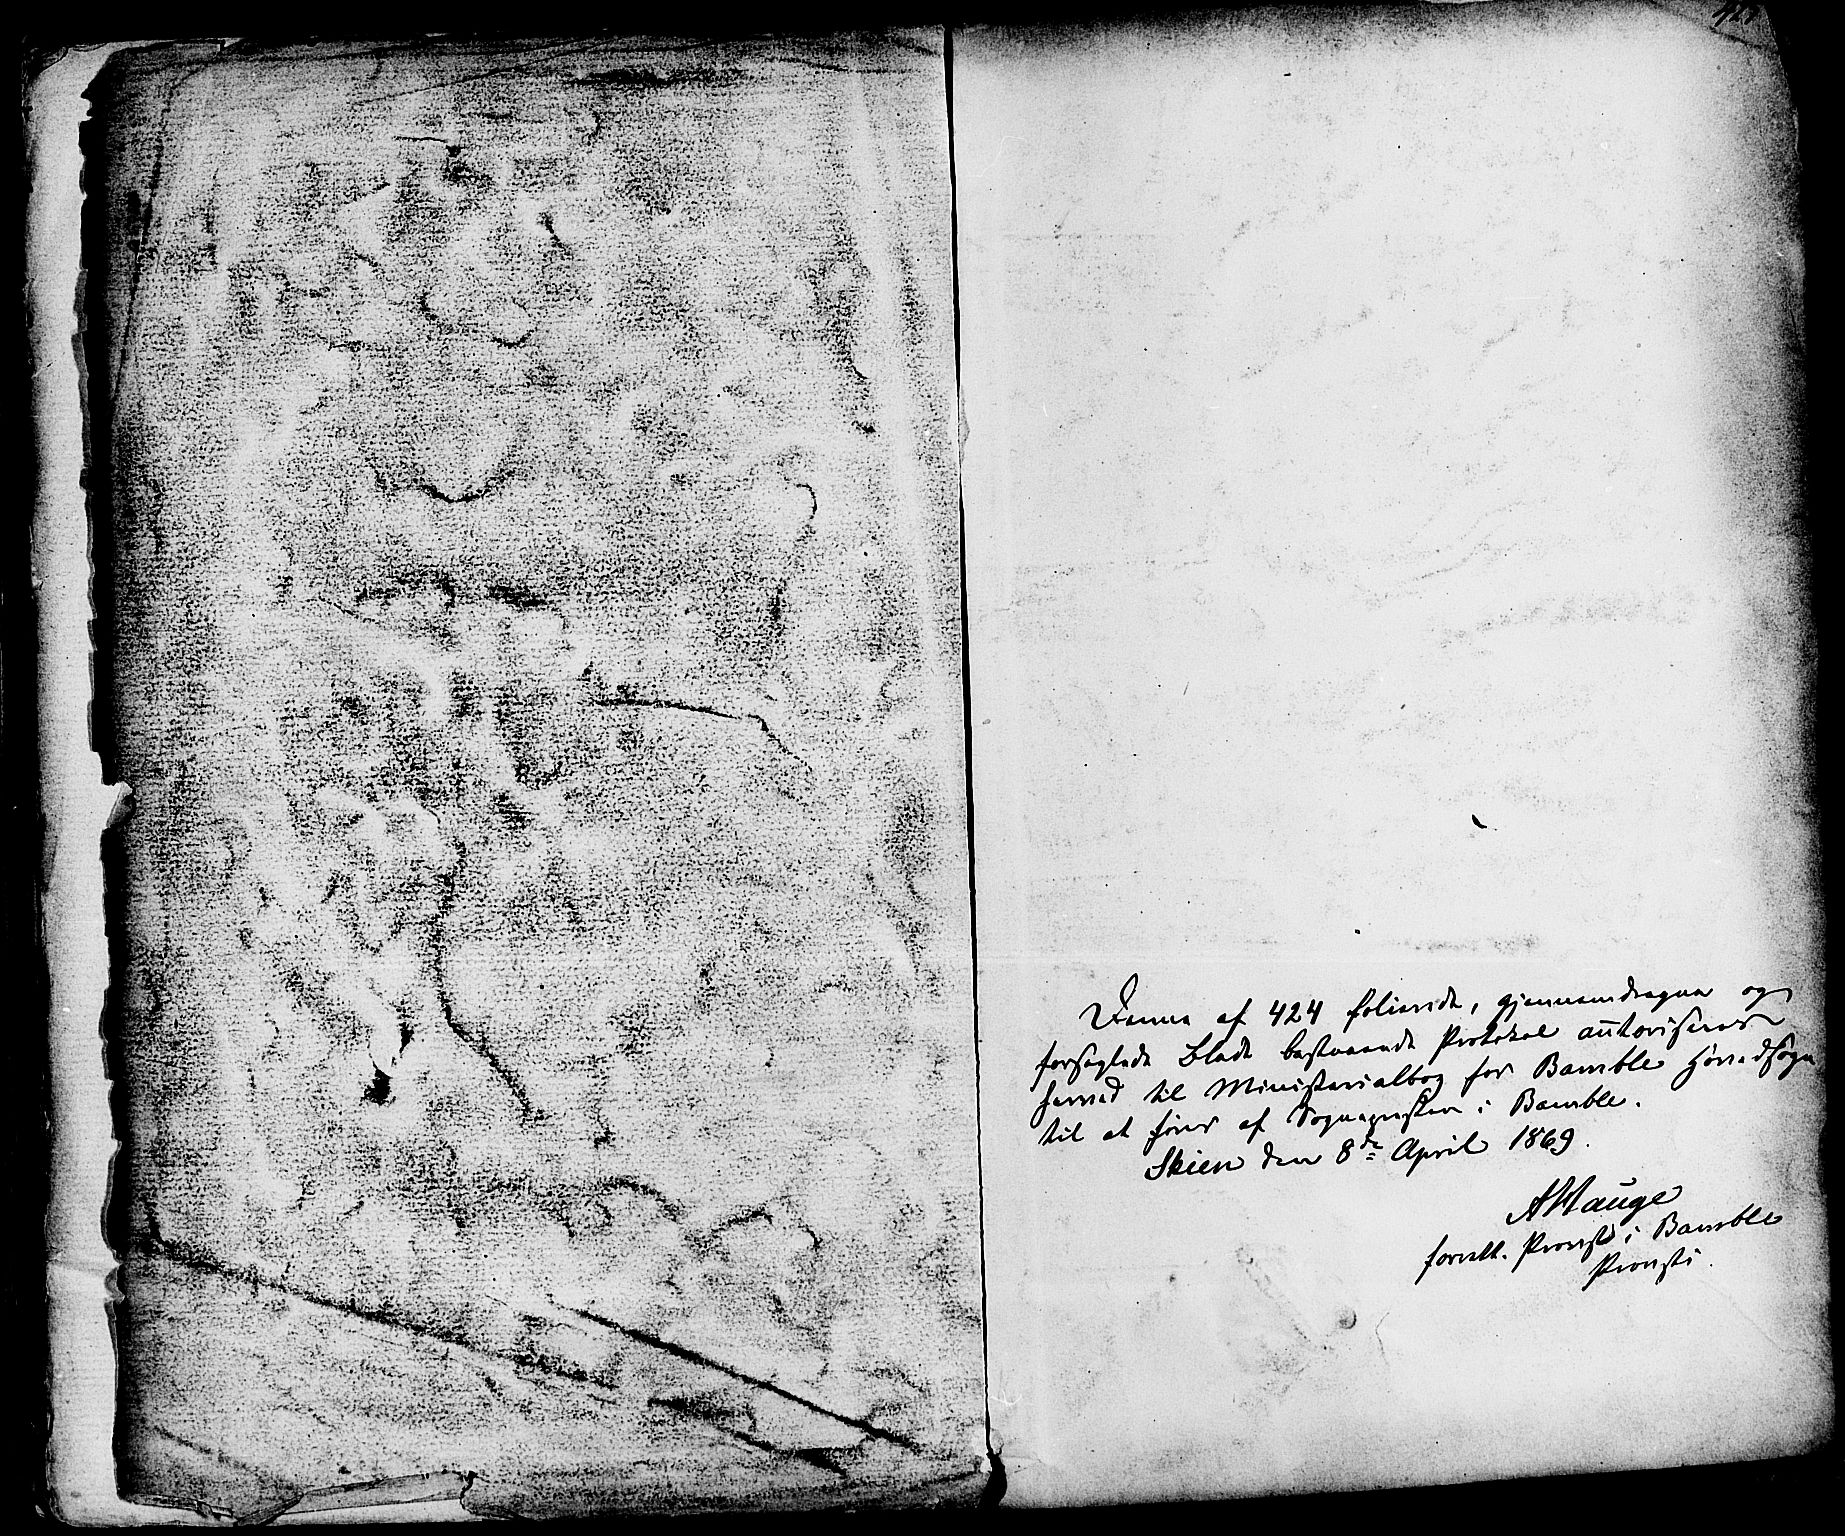 SAKO, Bamble kirkebøker, F/Fa/L0006: Ministerialbok nr. I 6, 1869-1877, s. 425